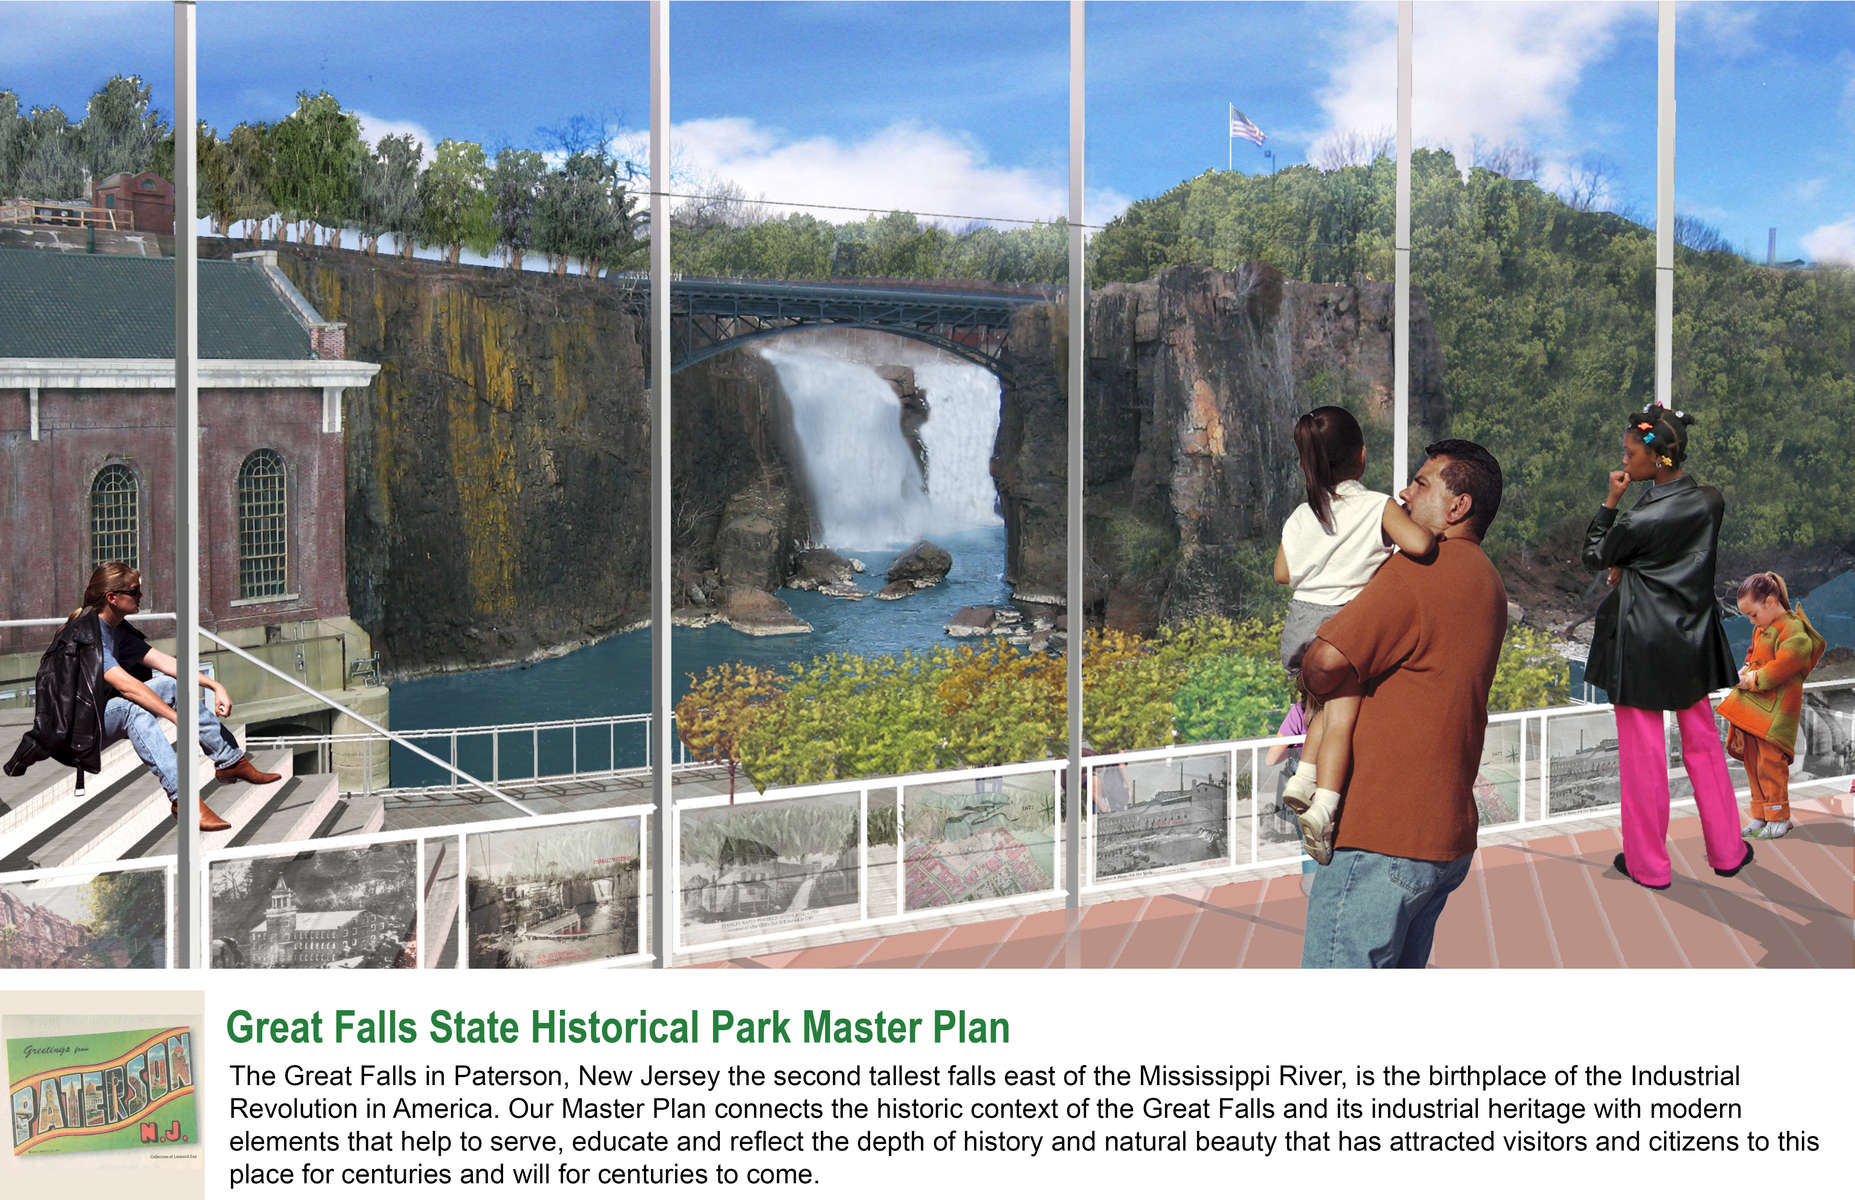 Great Falls Urban Park Master Plan